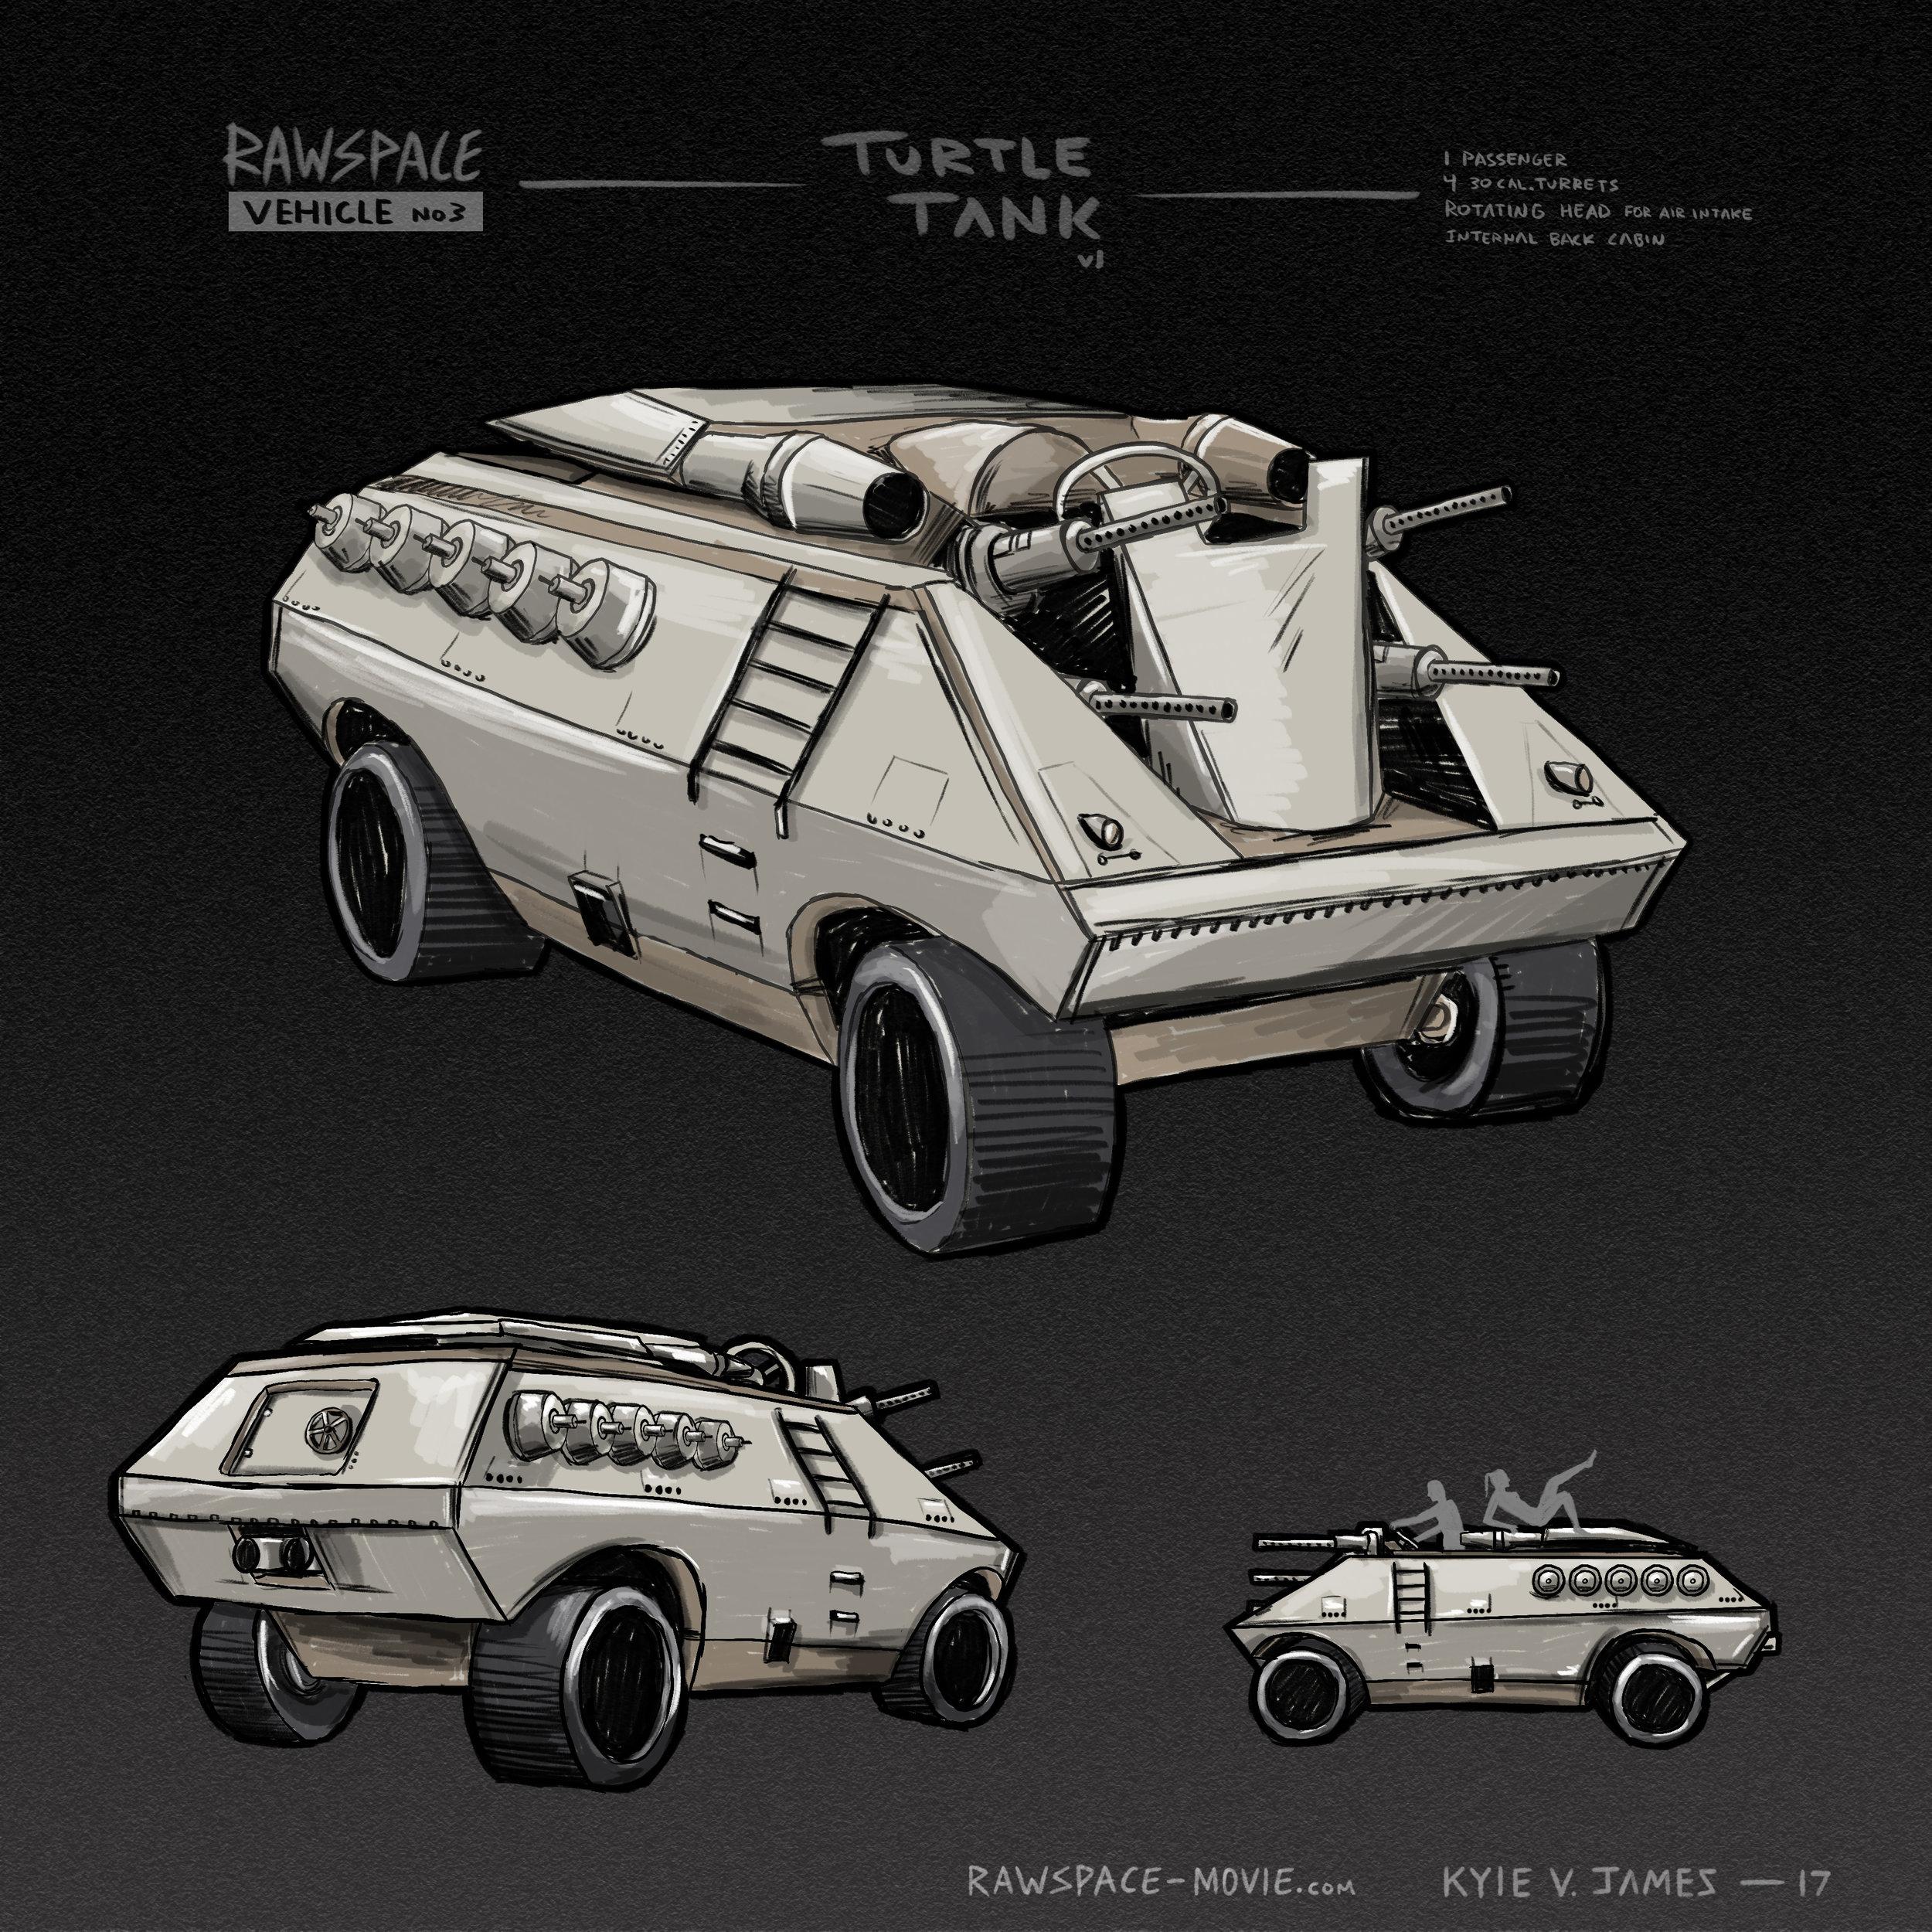 17-8-2 Turtle Tank2 ppl.jpg